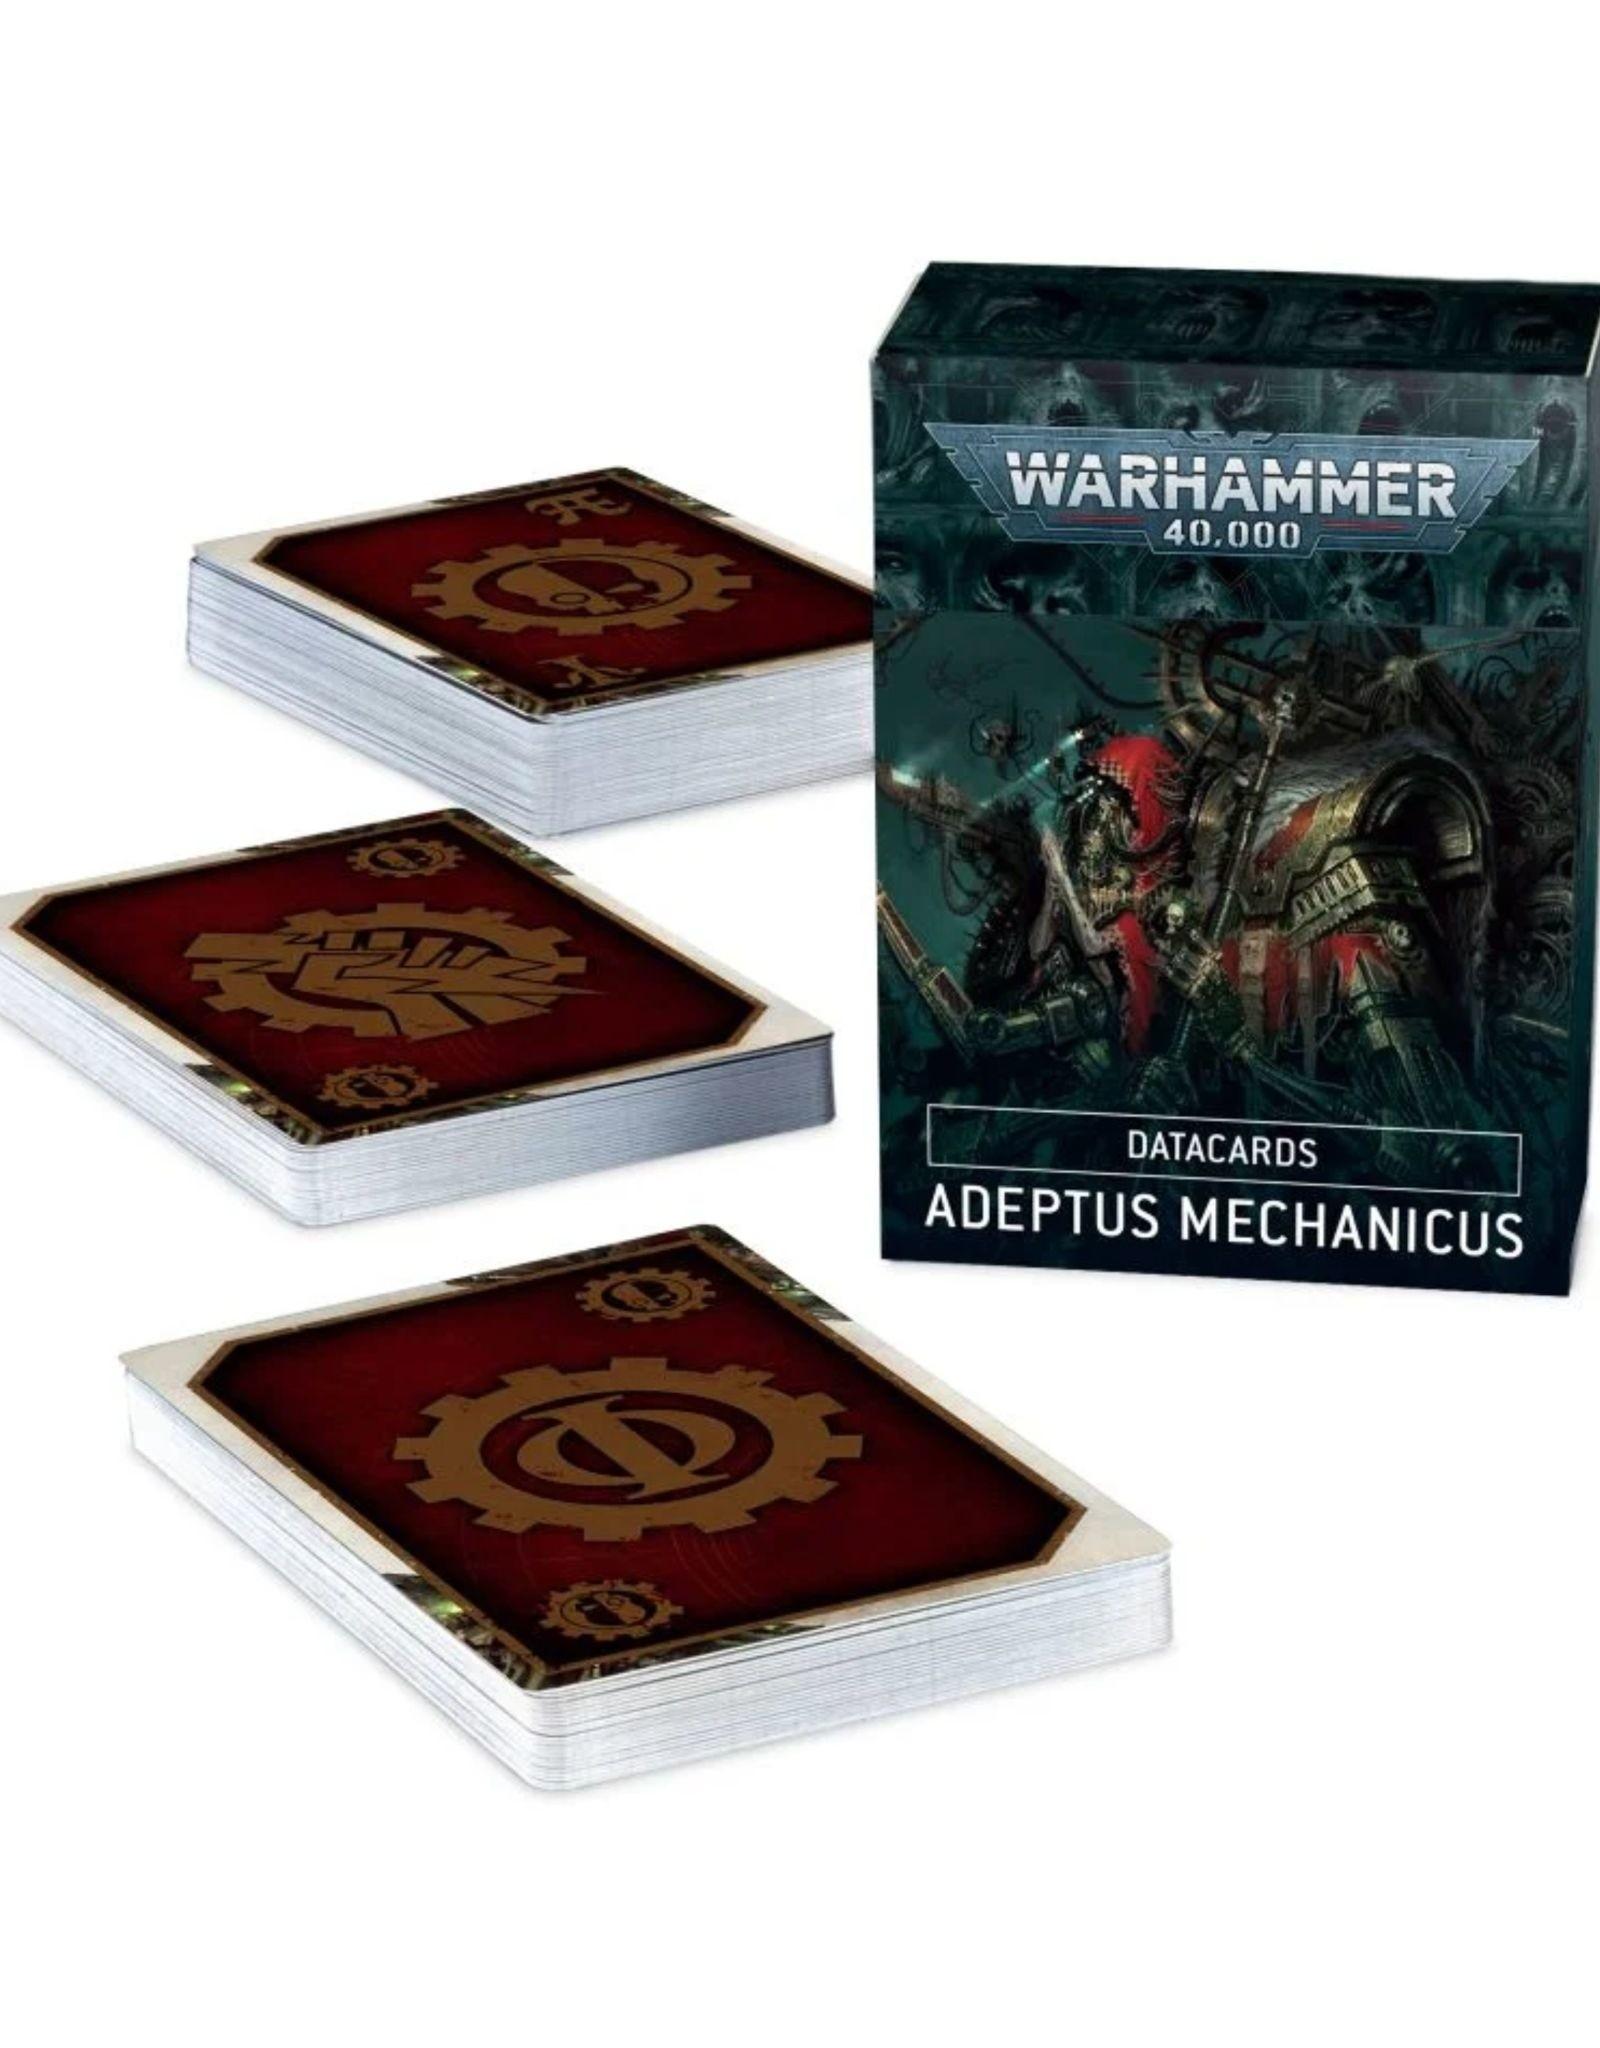 Warhammer 40k Adeptus Mechanicus Datacards 9th Edition